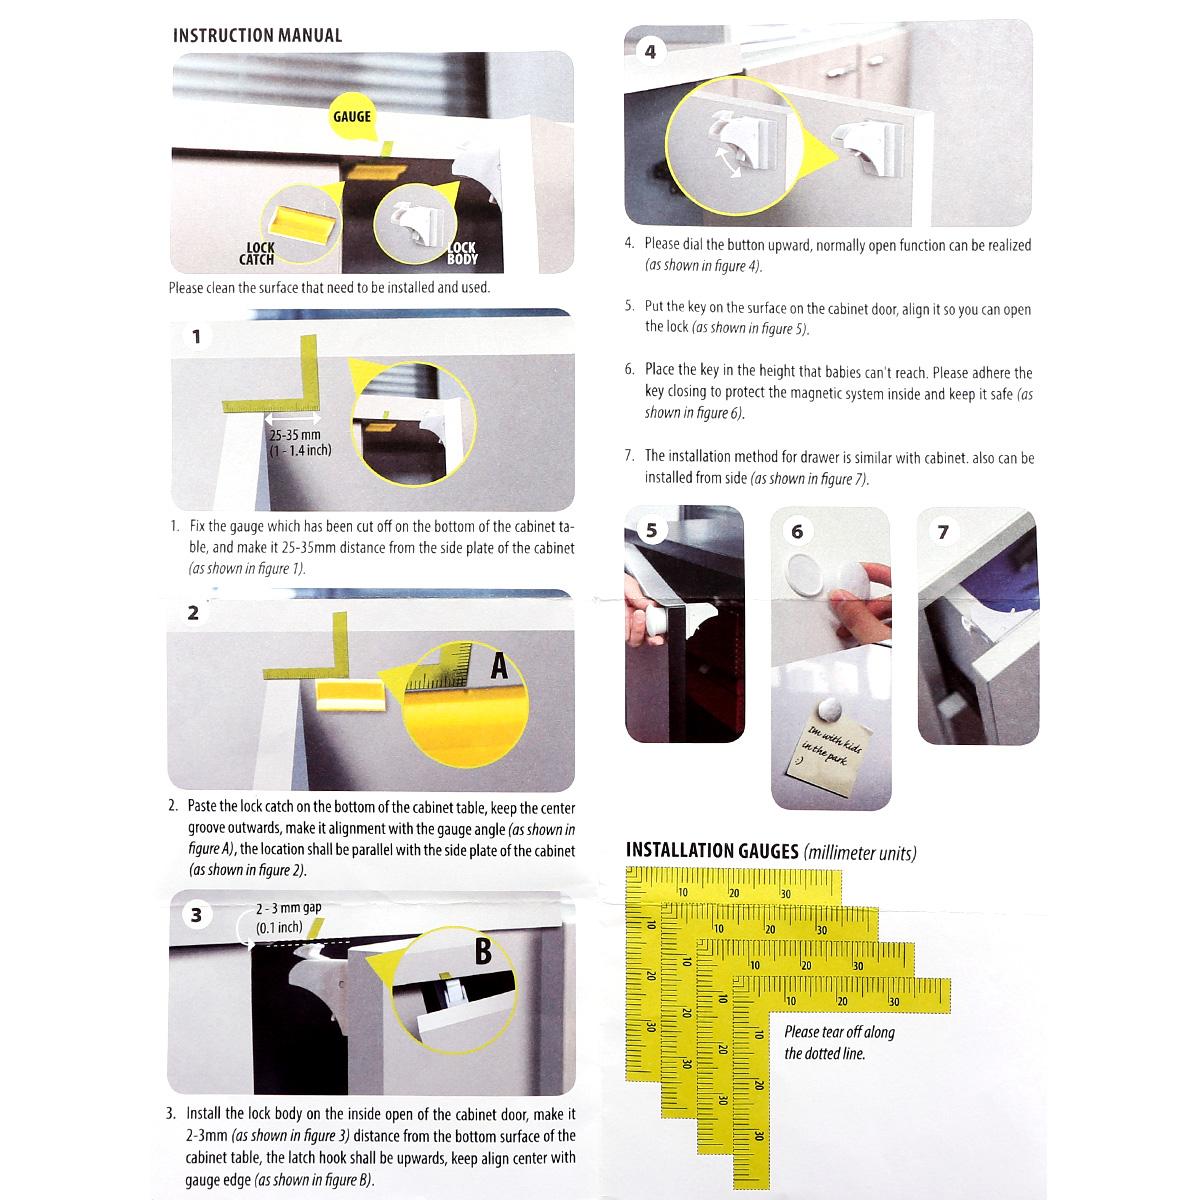 8 serrures magn tique 2 cl bloque porte tiroir placard s curit b b enfant ebay. Black Bedroom Furniture Sets. Home Design Ideas